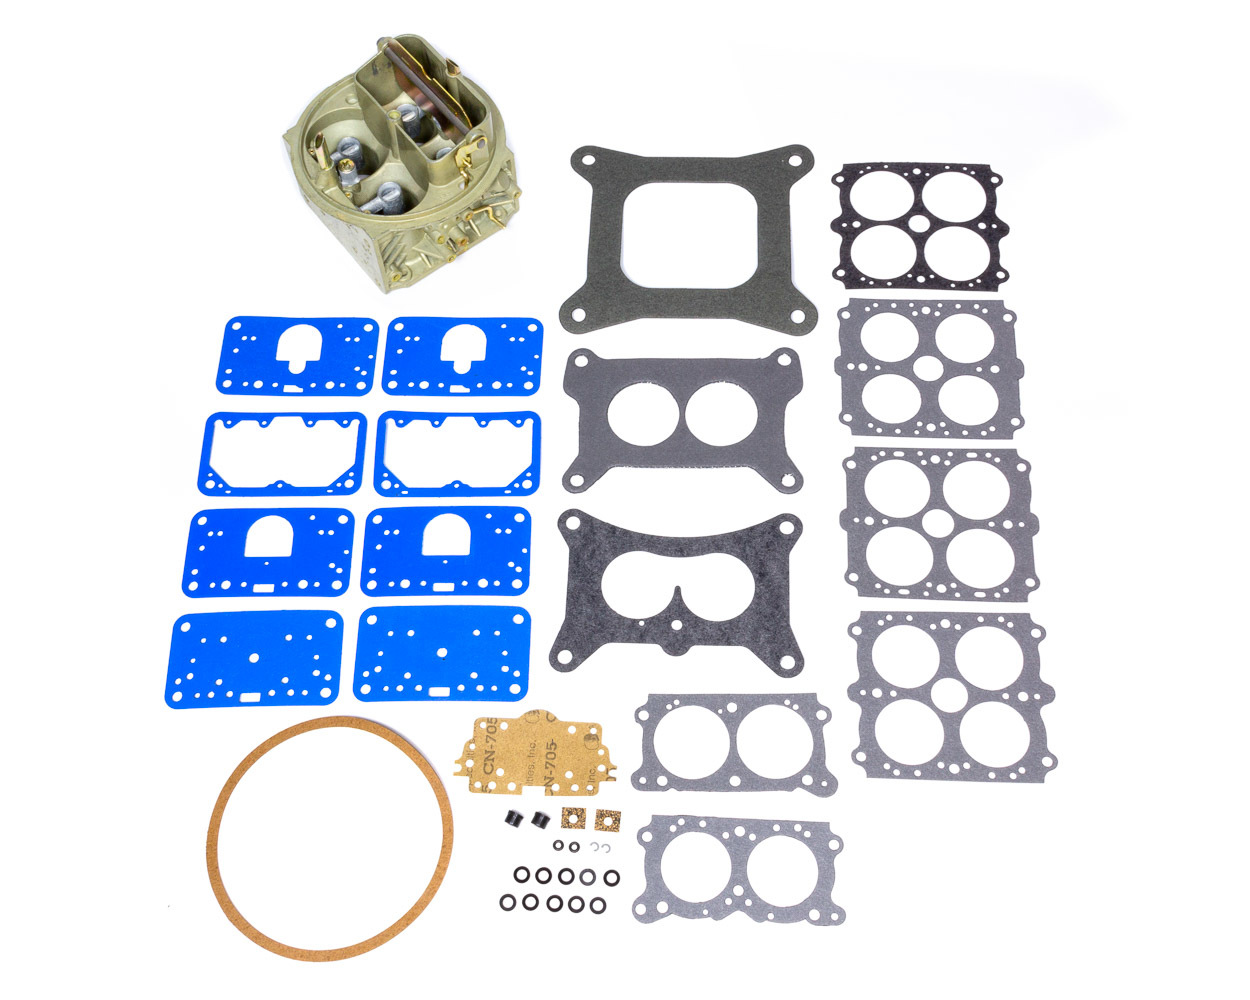 Holley 134-336 Carburetor Main Body, Replacement, 650 CFM, Zinc, Chromate, Holley Double Pumper Carburetor, Kit